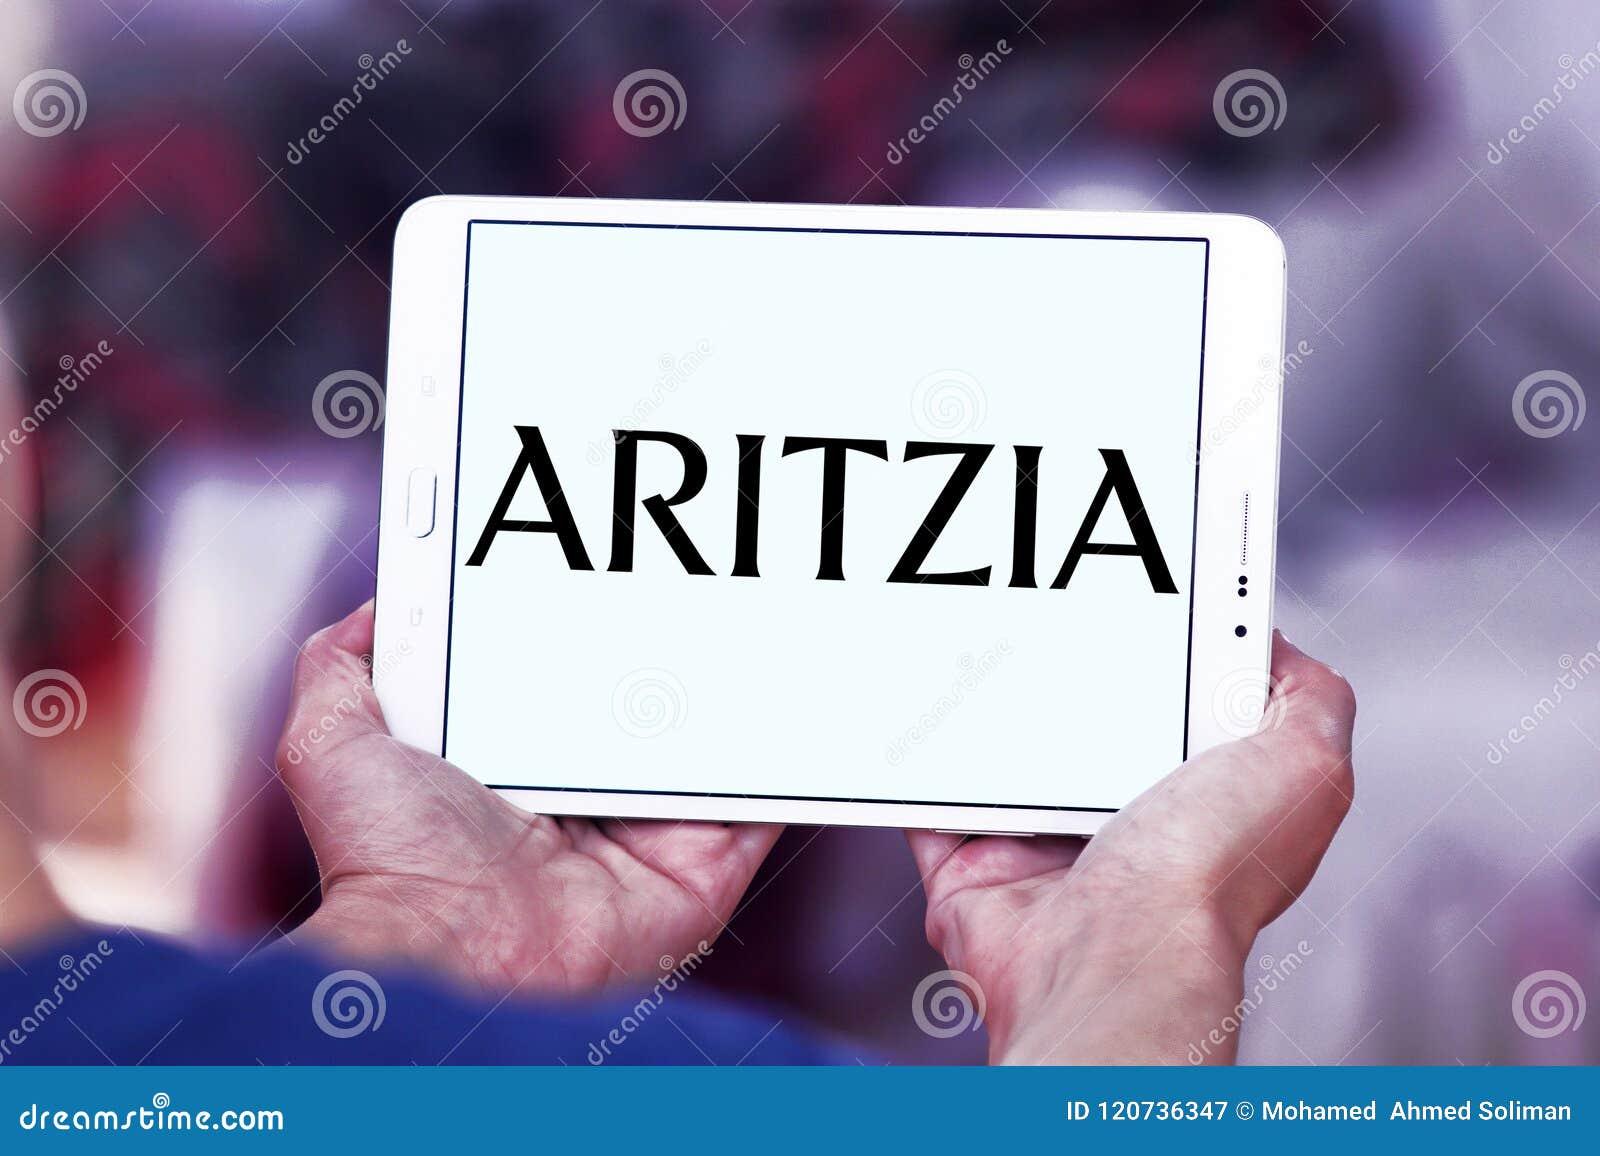 Aritzia fashion brand logo